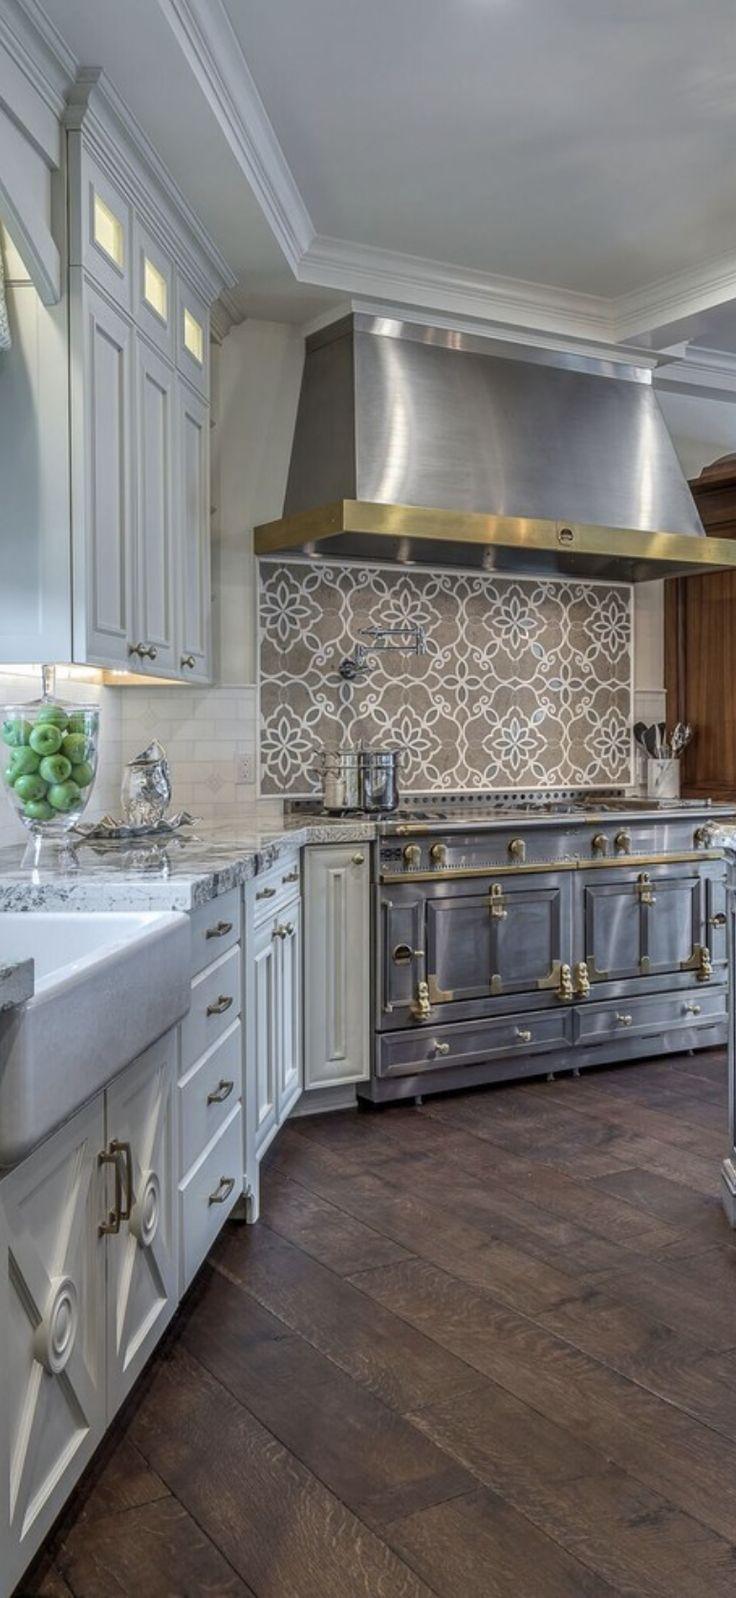 Best 25 Tuscan Kitchen Decor Ideas On Pinterest Kitchen Utensil Organization Rustic Cooking